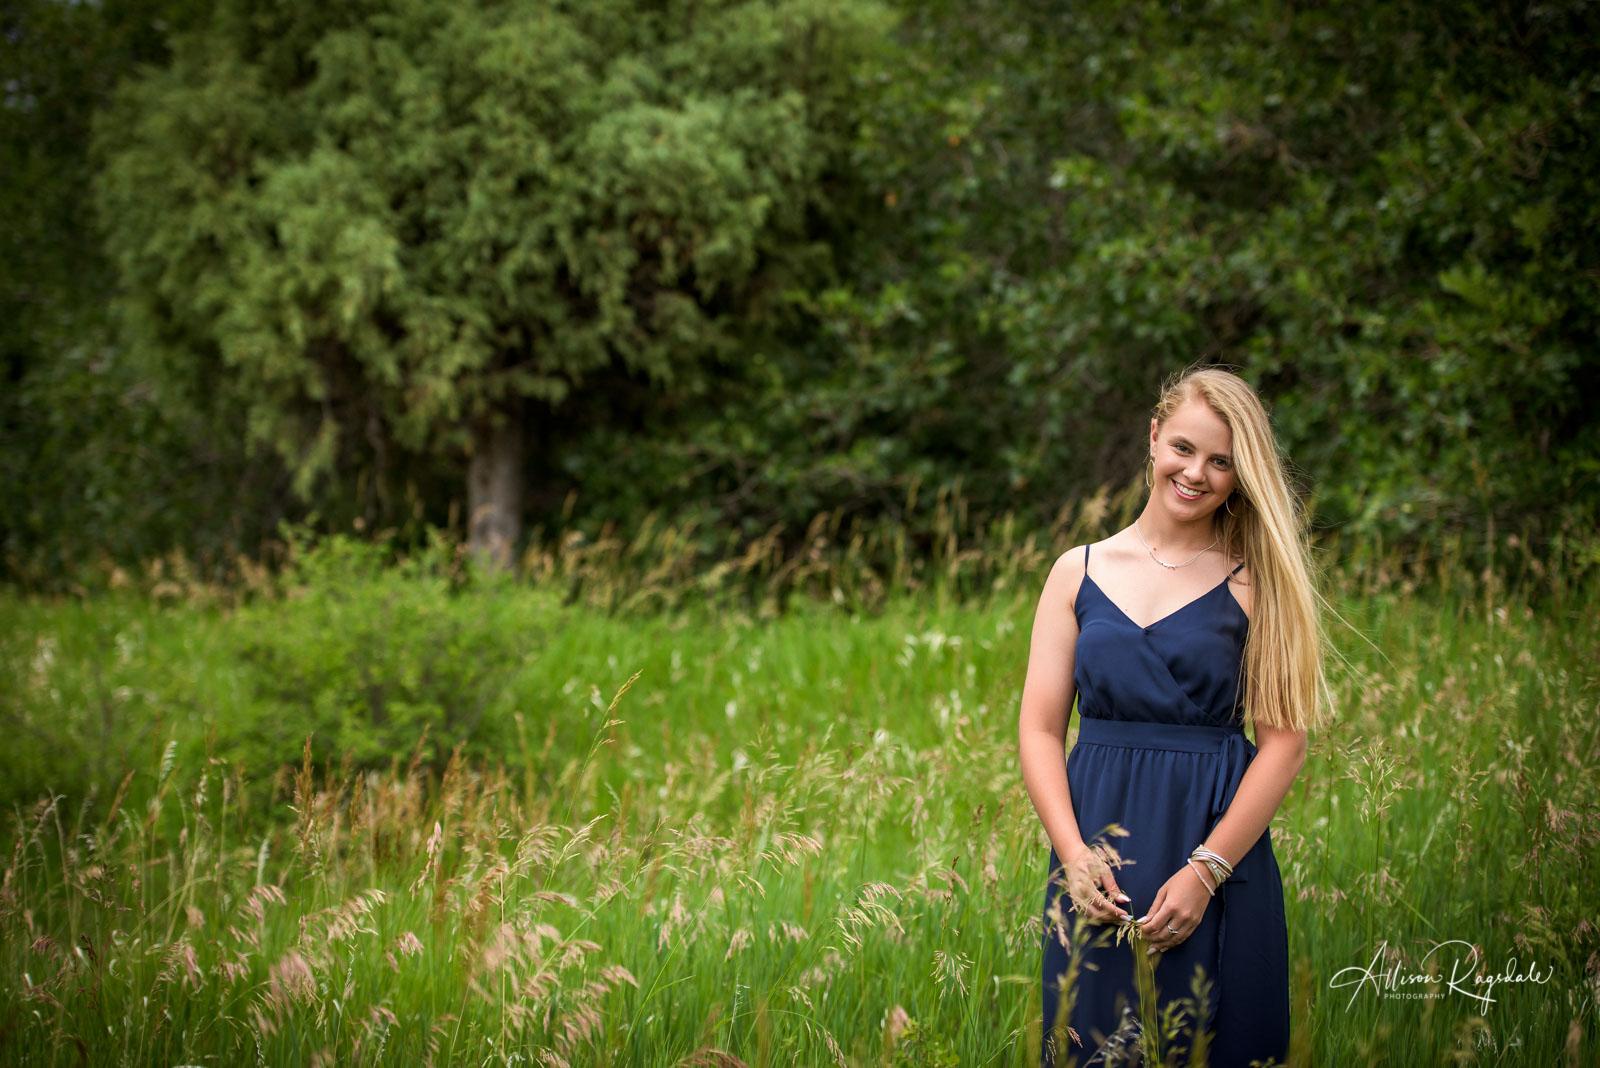 outdoor senior portraits in Durango Colorado by Allison Ragsdale Photography